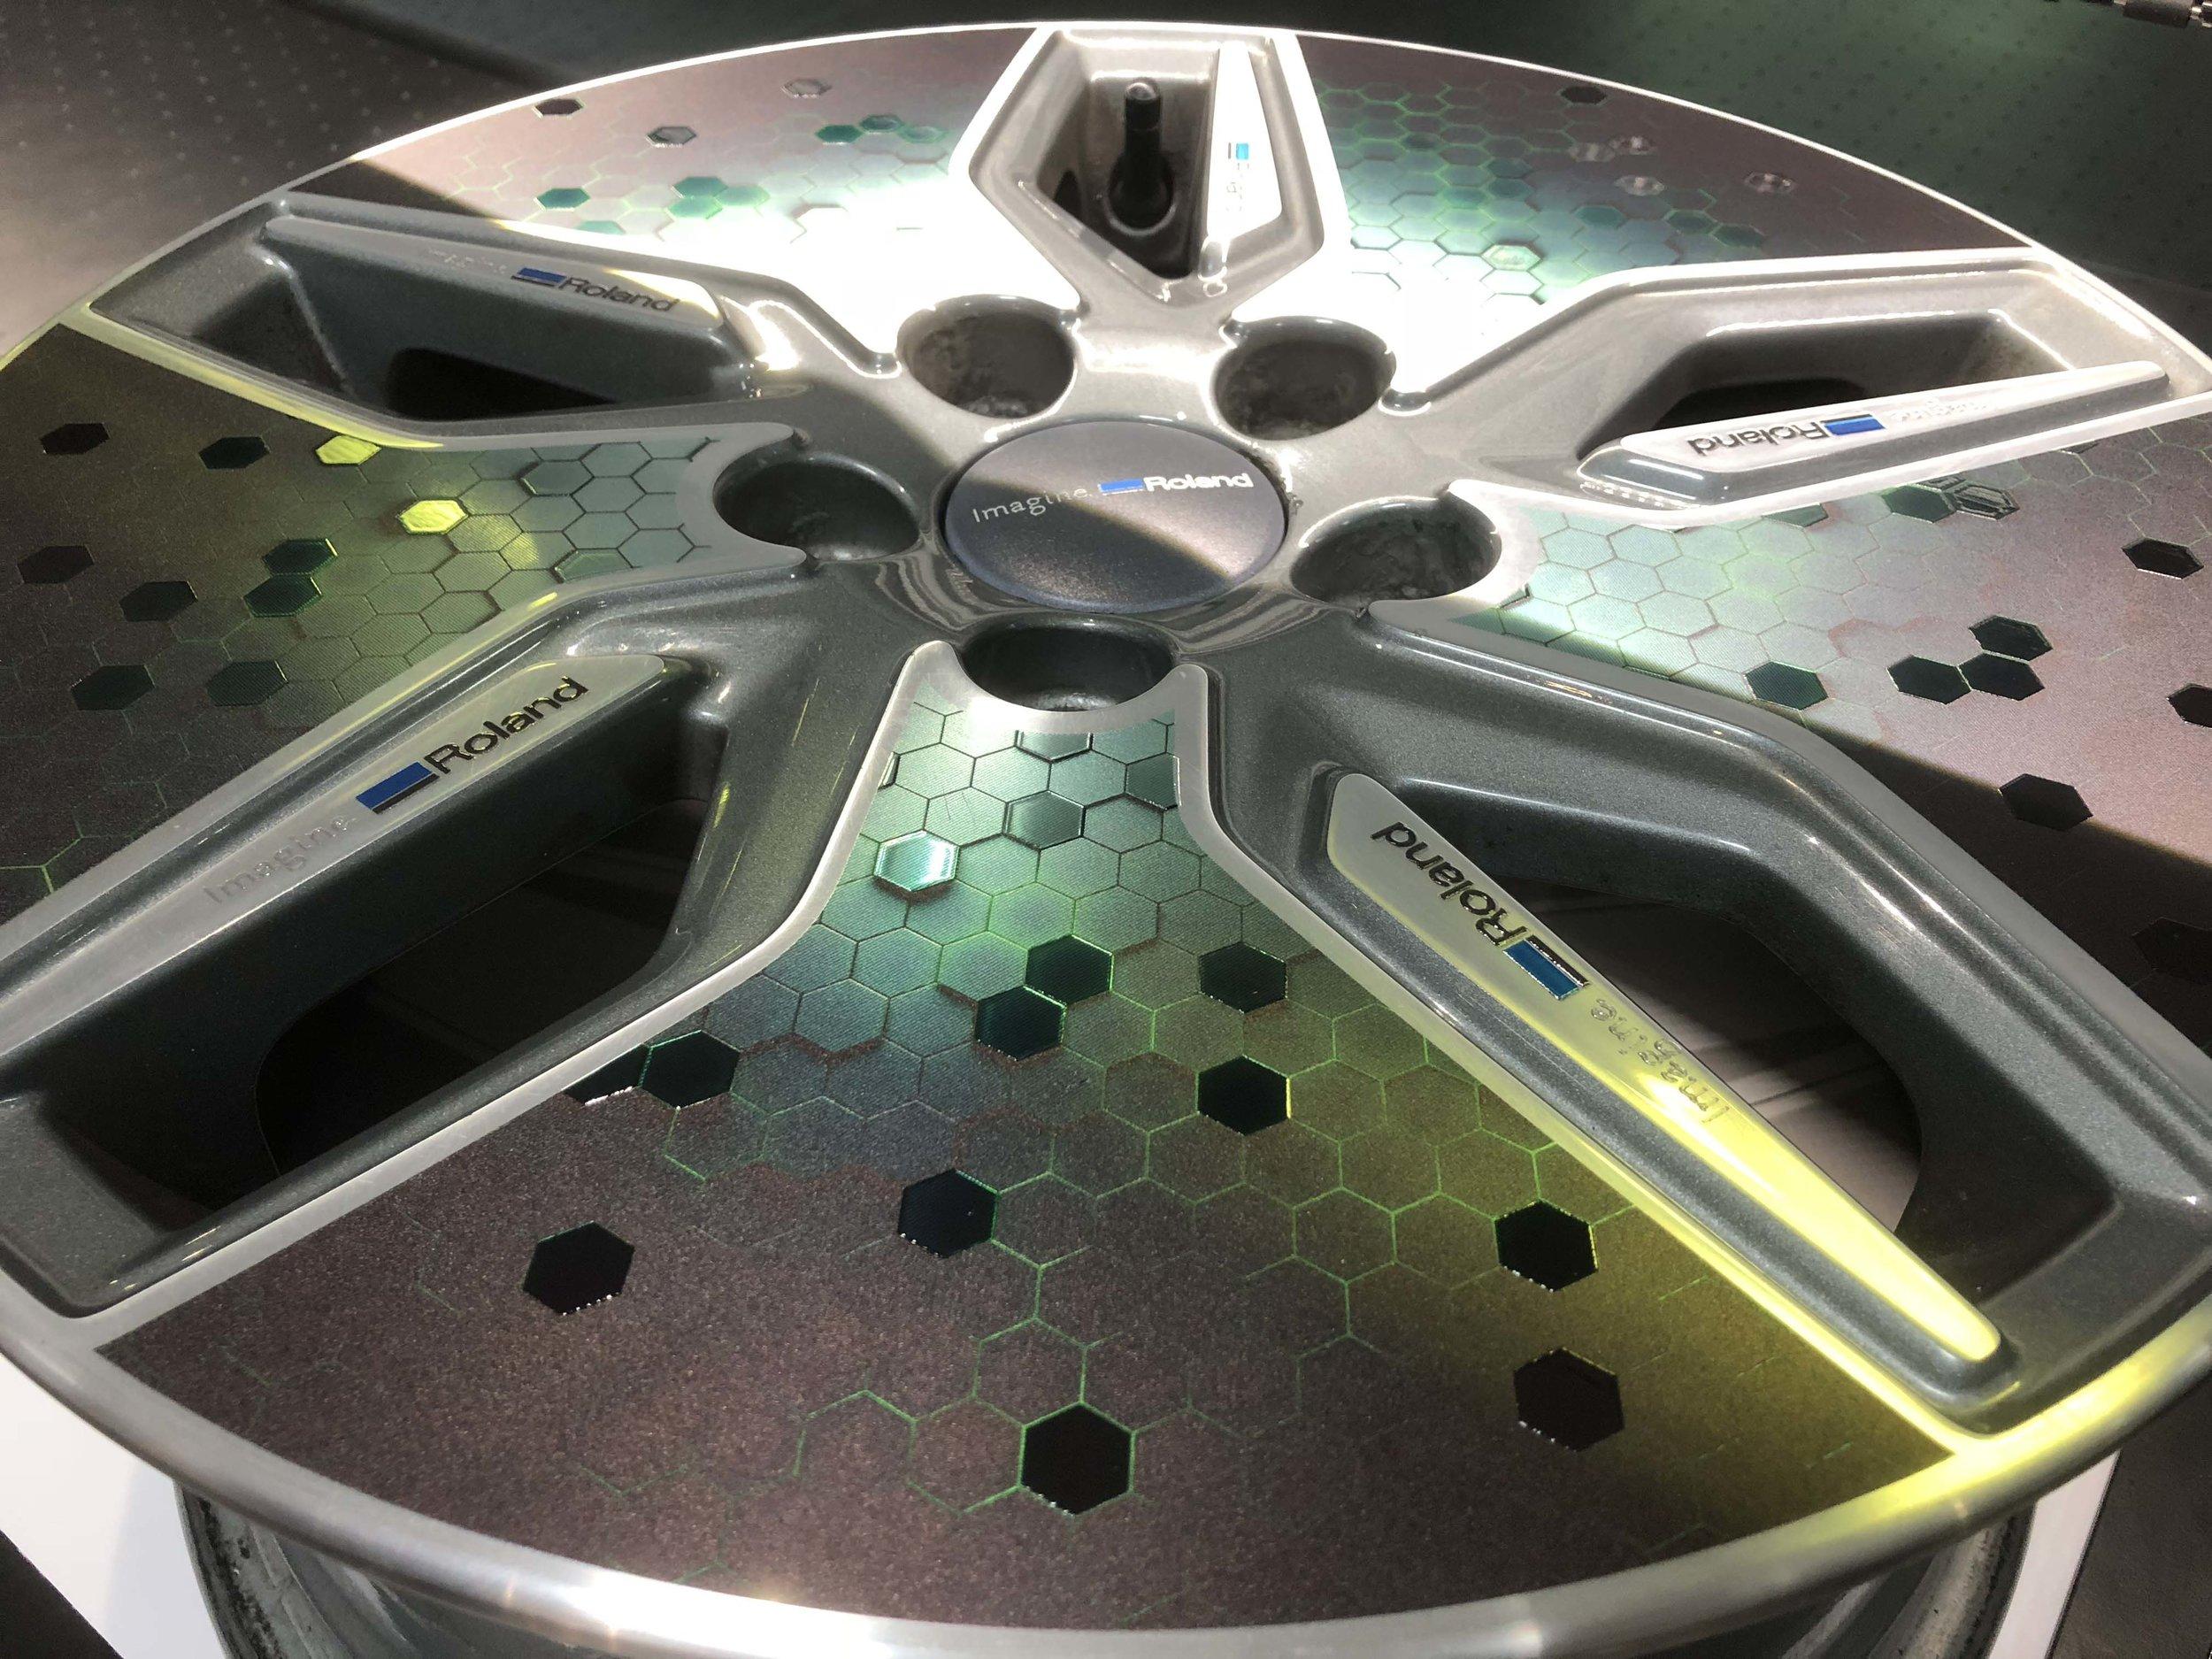 Alloy wheel rim printed on the S-Series